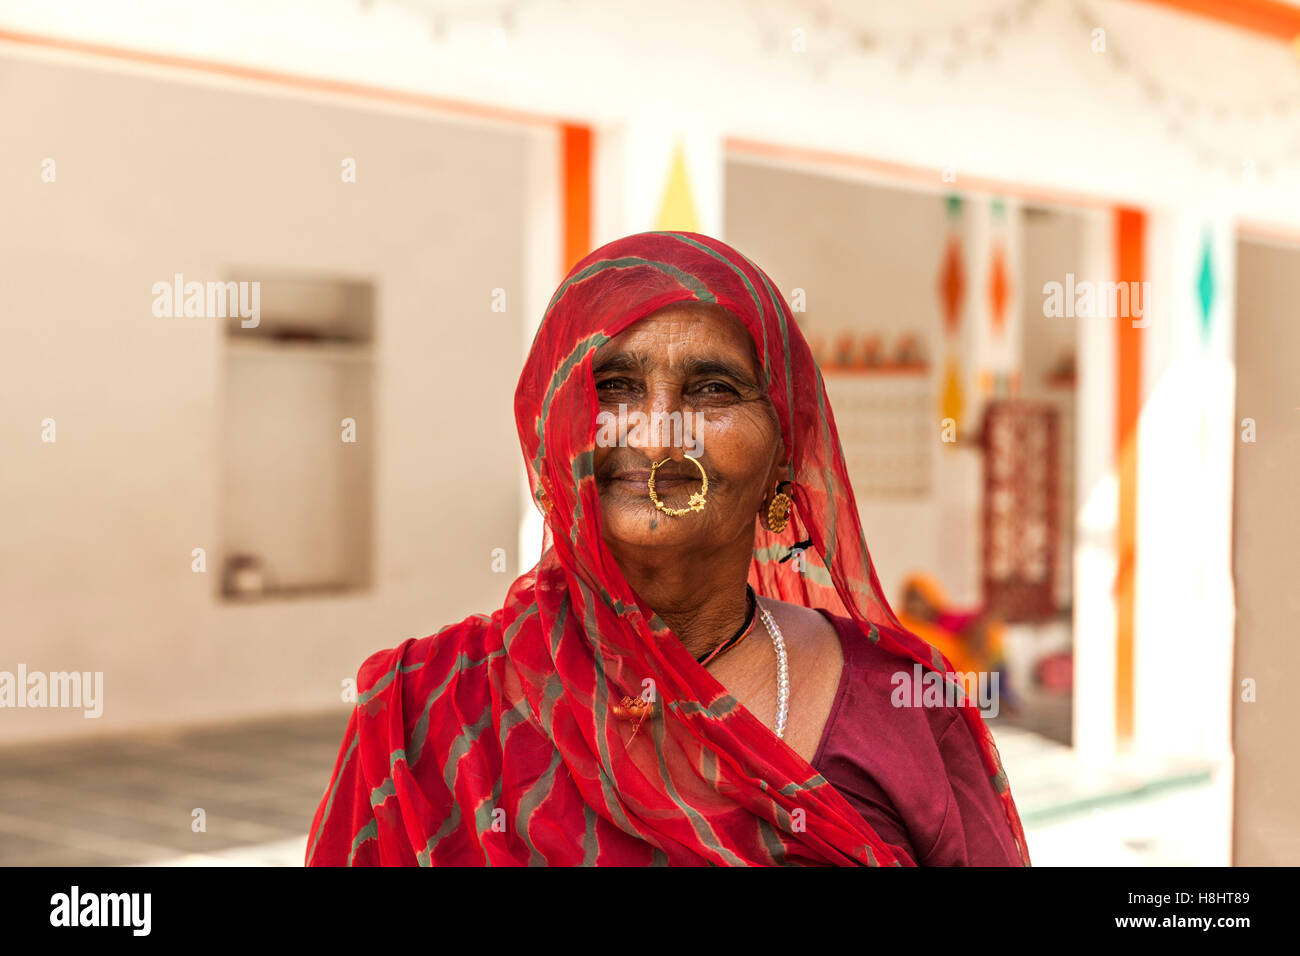 Rajasthani woman - Stock Image